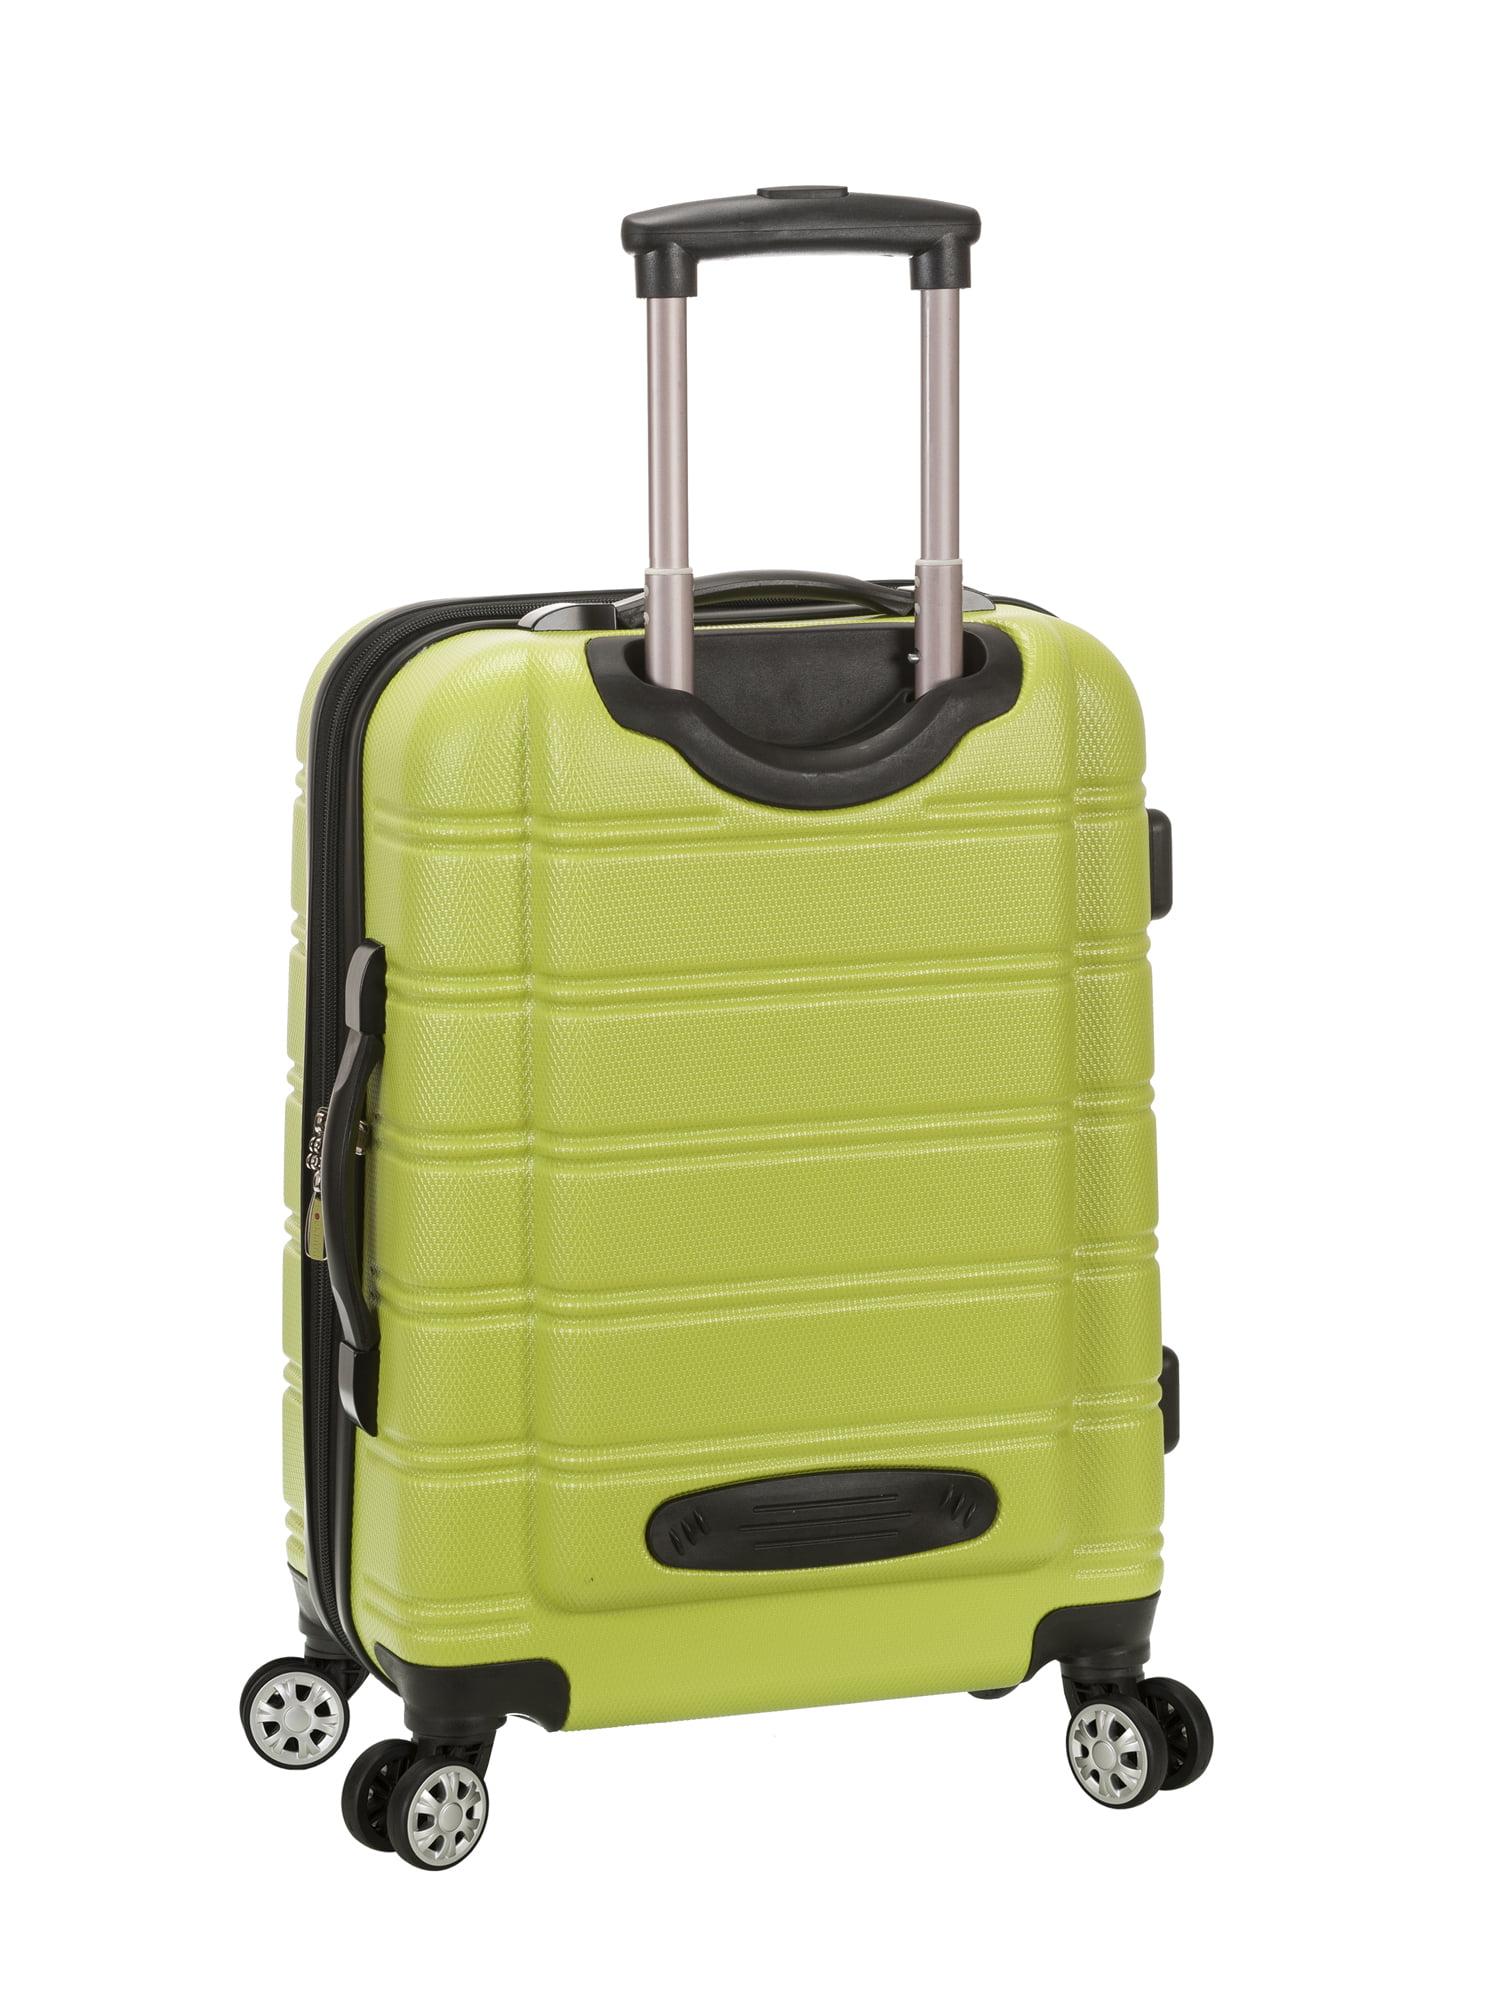 Rockland Melbourne 3 Piece Hardside Luggage Set - Walmart.com